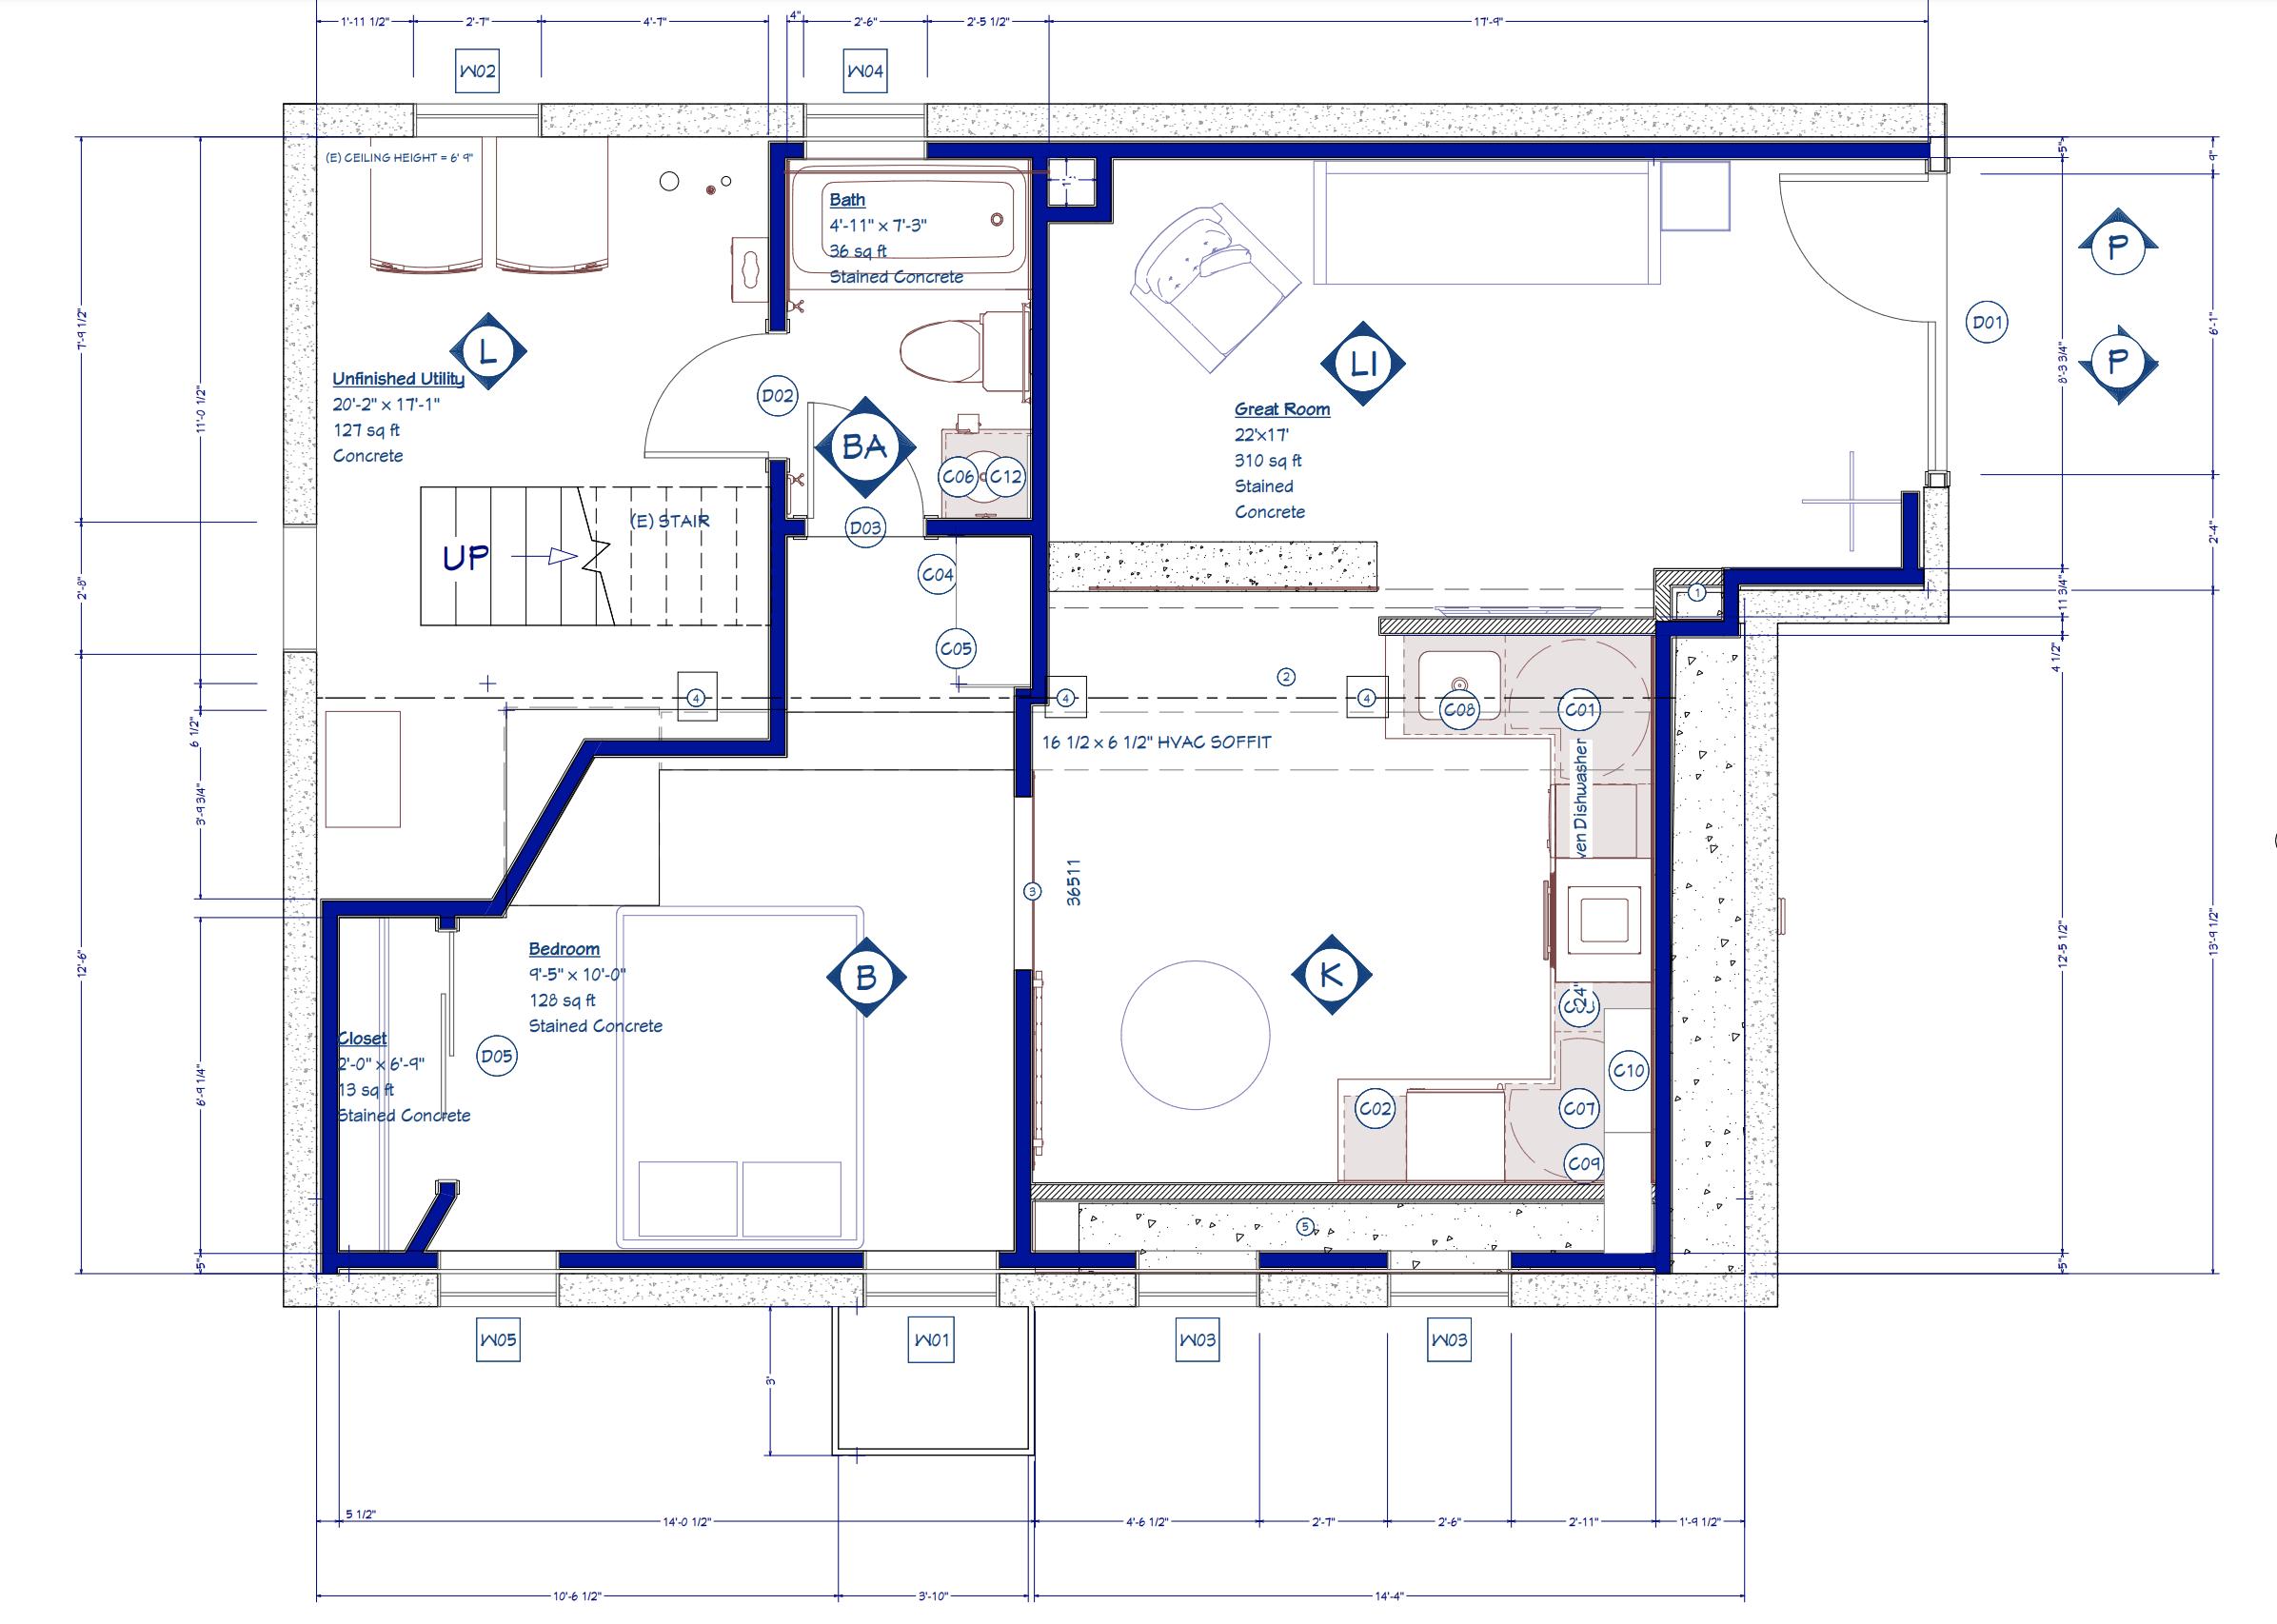 Hawthorne Basement Accessory Dwelling Unit floorplan